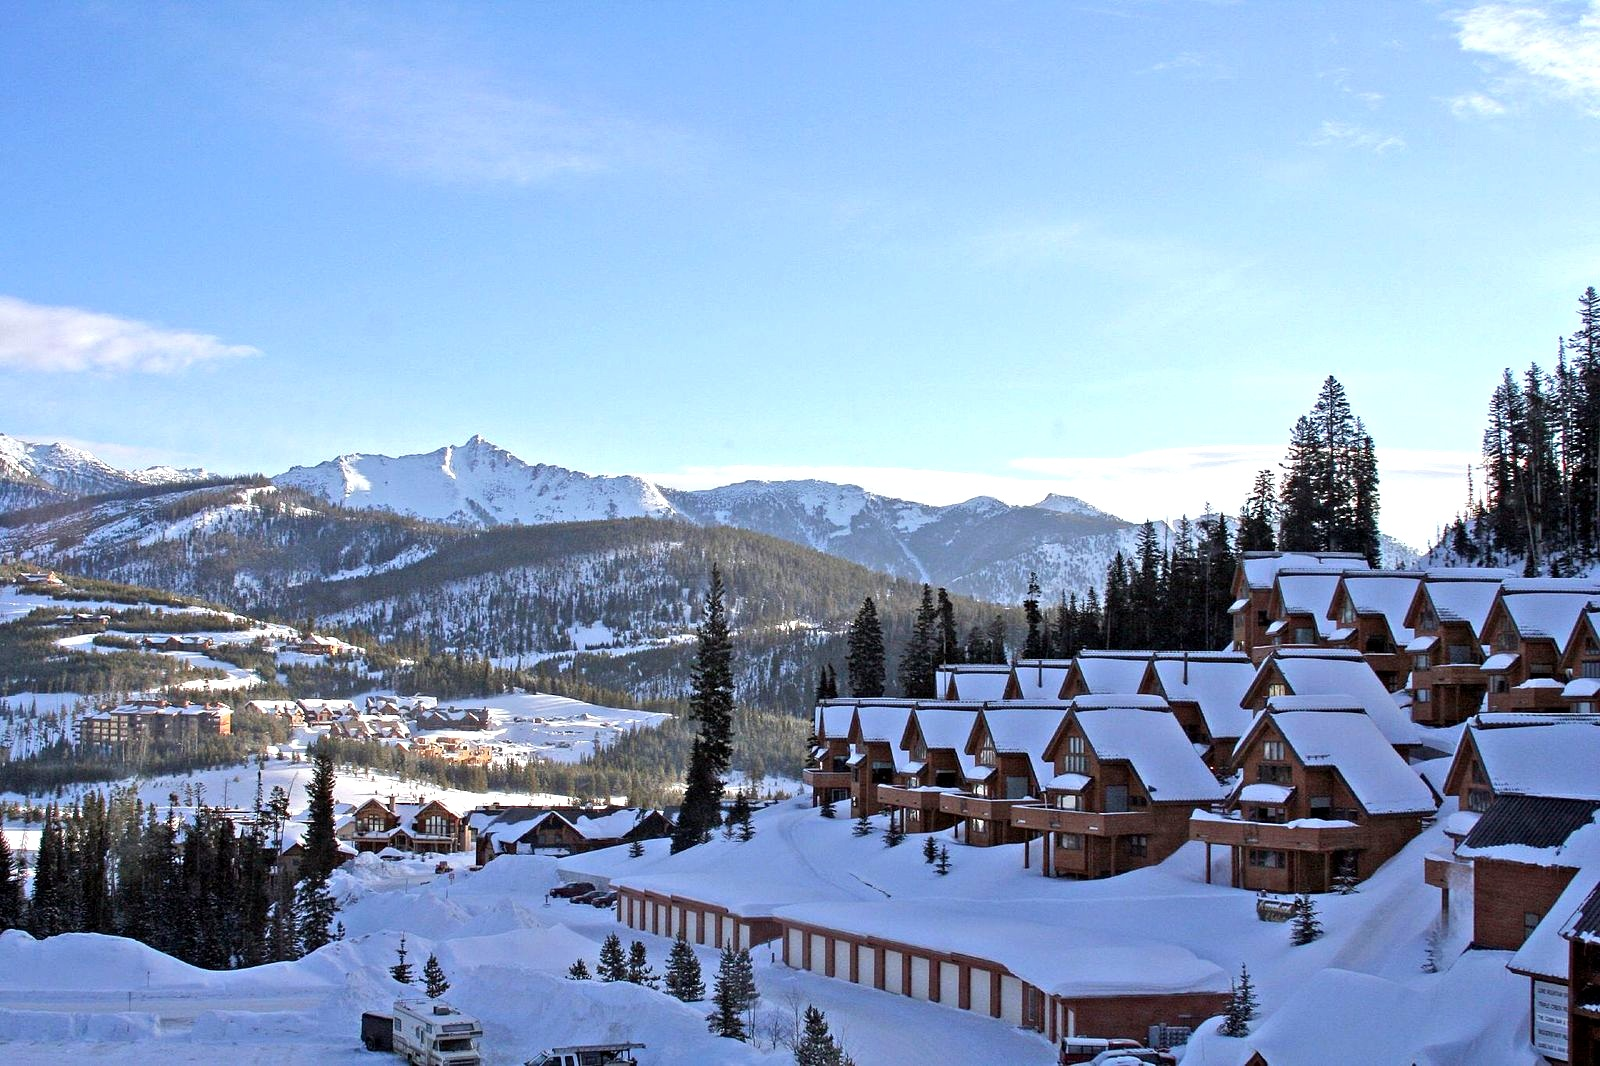 Montana's Big Sky Resort comprises just under 6,000 acres of ski terrain (Image:  Wikimedia Commons )